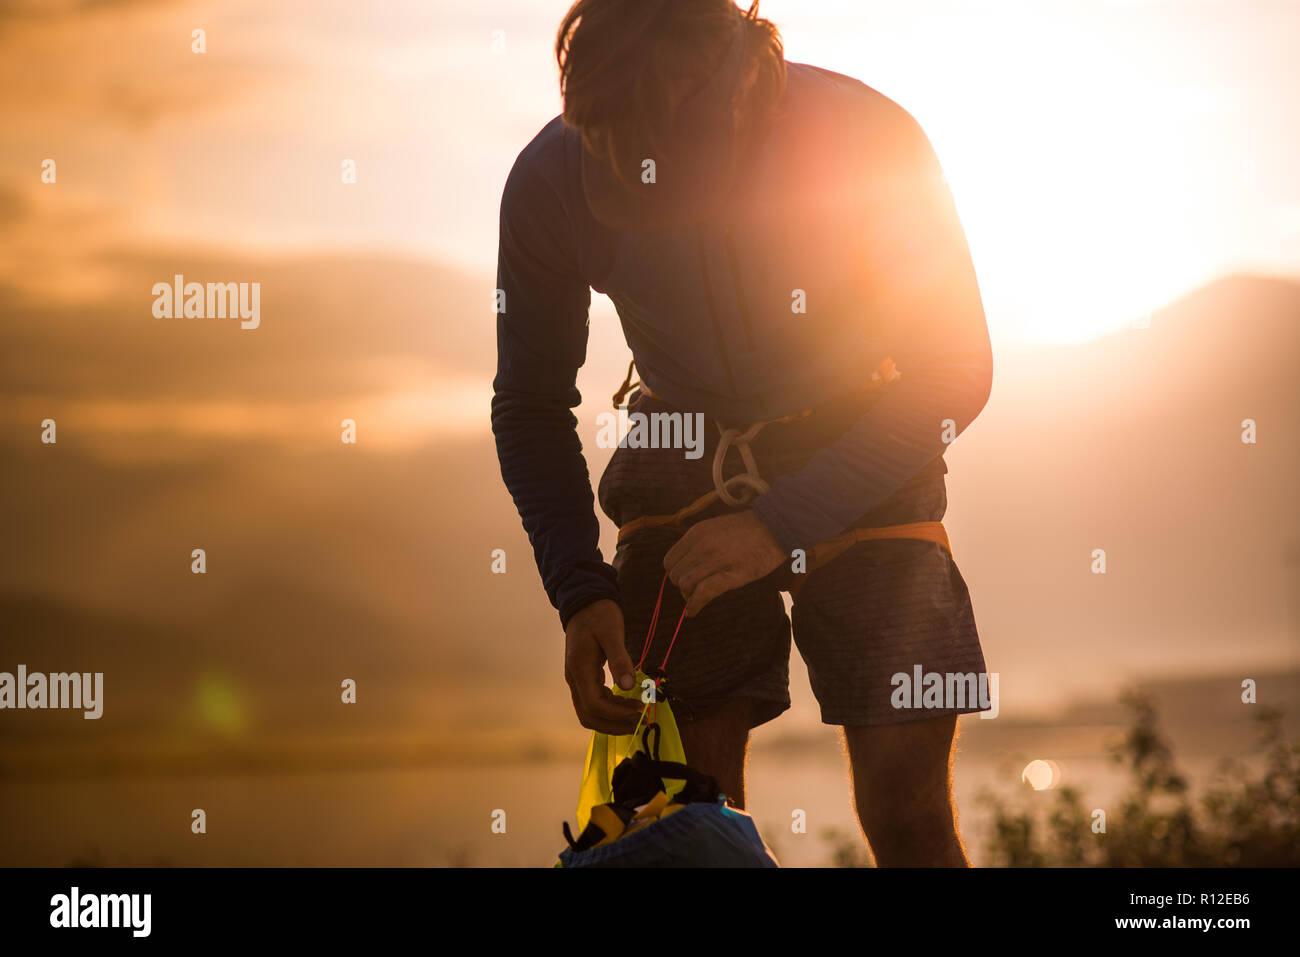 L'homme sur l'escalade voyage, Squamish, Canada Photo Stock